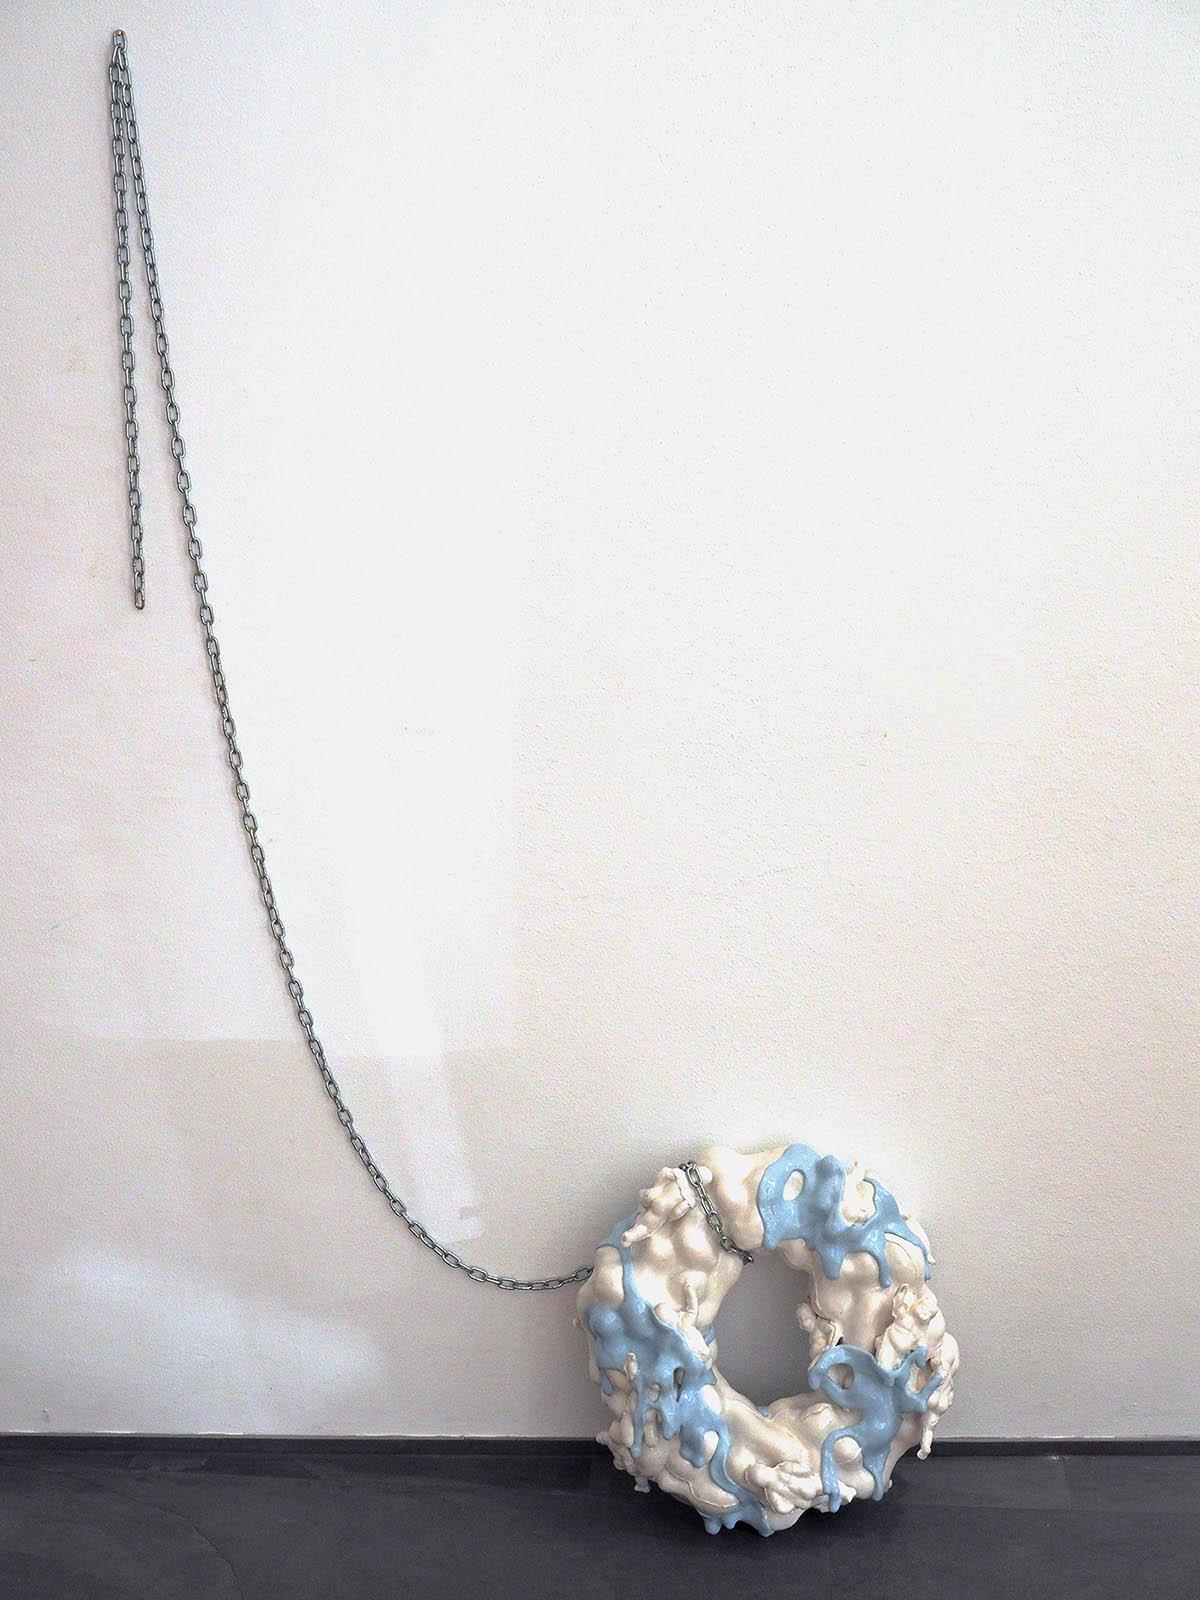 Julia Belova Paradise Ring 2020 Porzellan, Kette 60 x 60 cm € 5600 .-